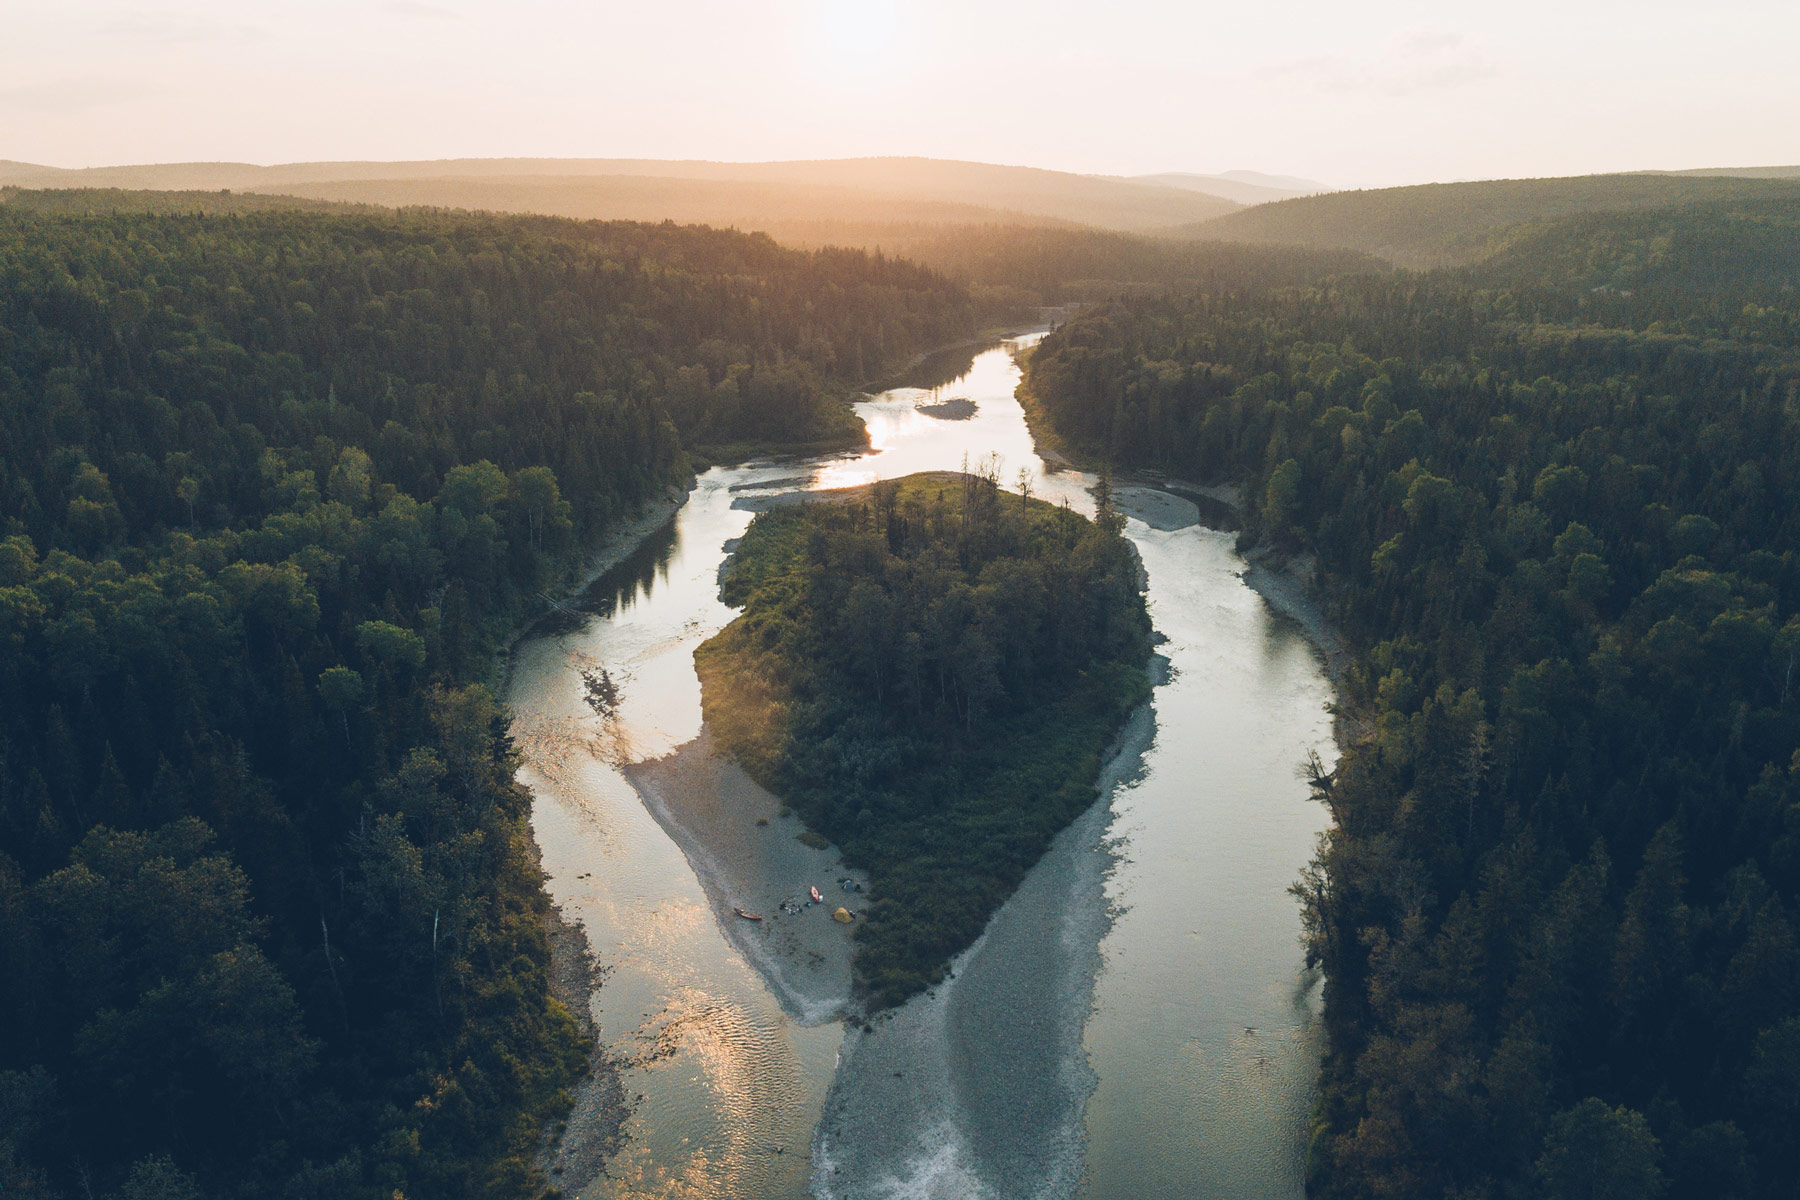 Kedgwick River, Canada